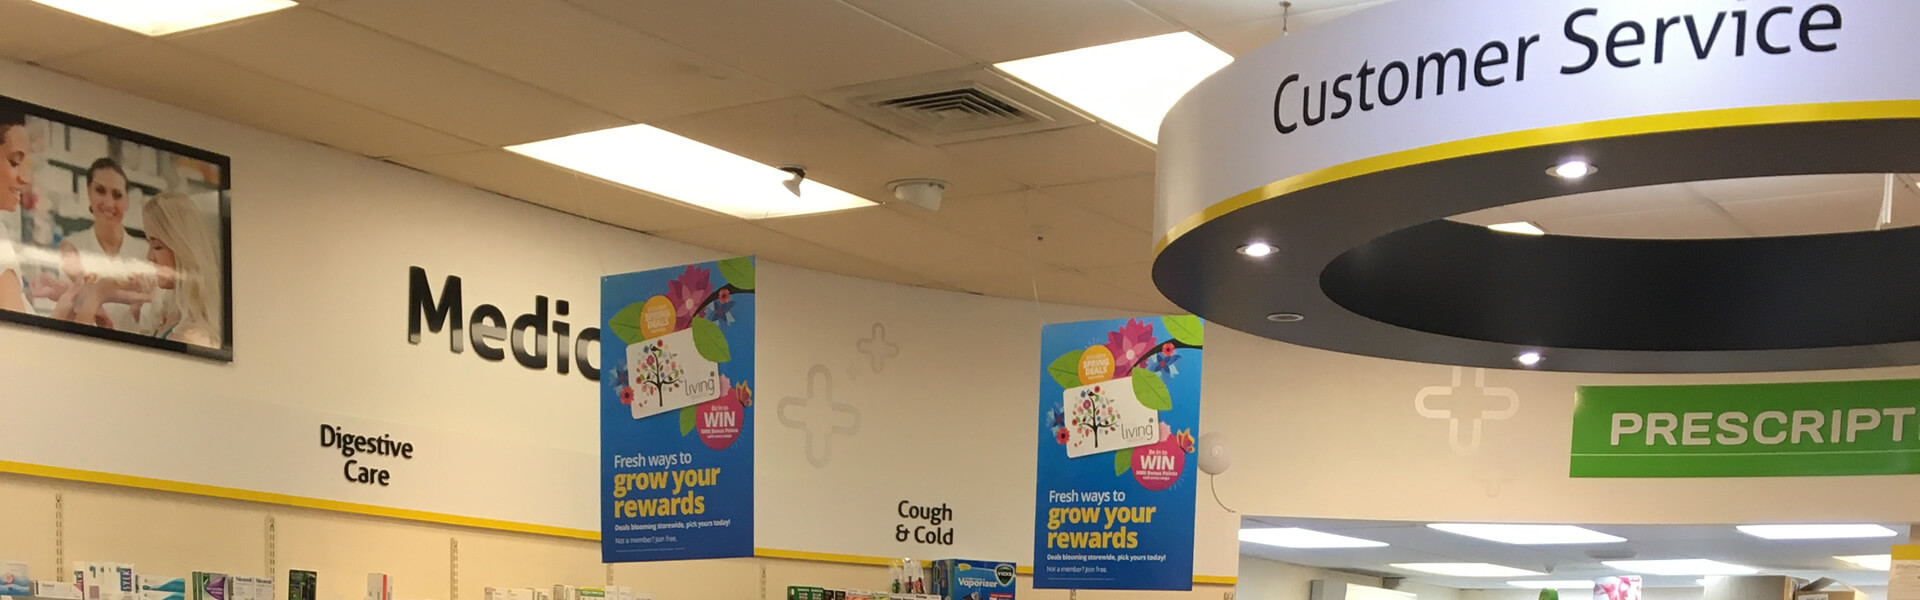 Store Interior 02 At Life Pharmacy Blenheim In Marlborough NZ